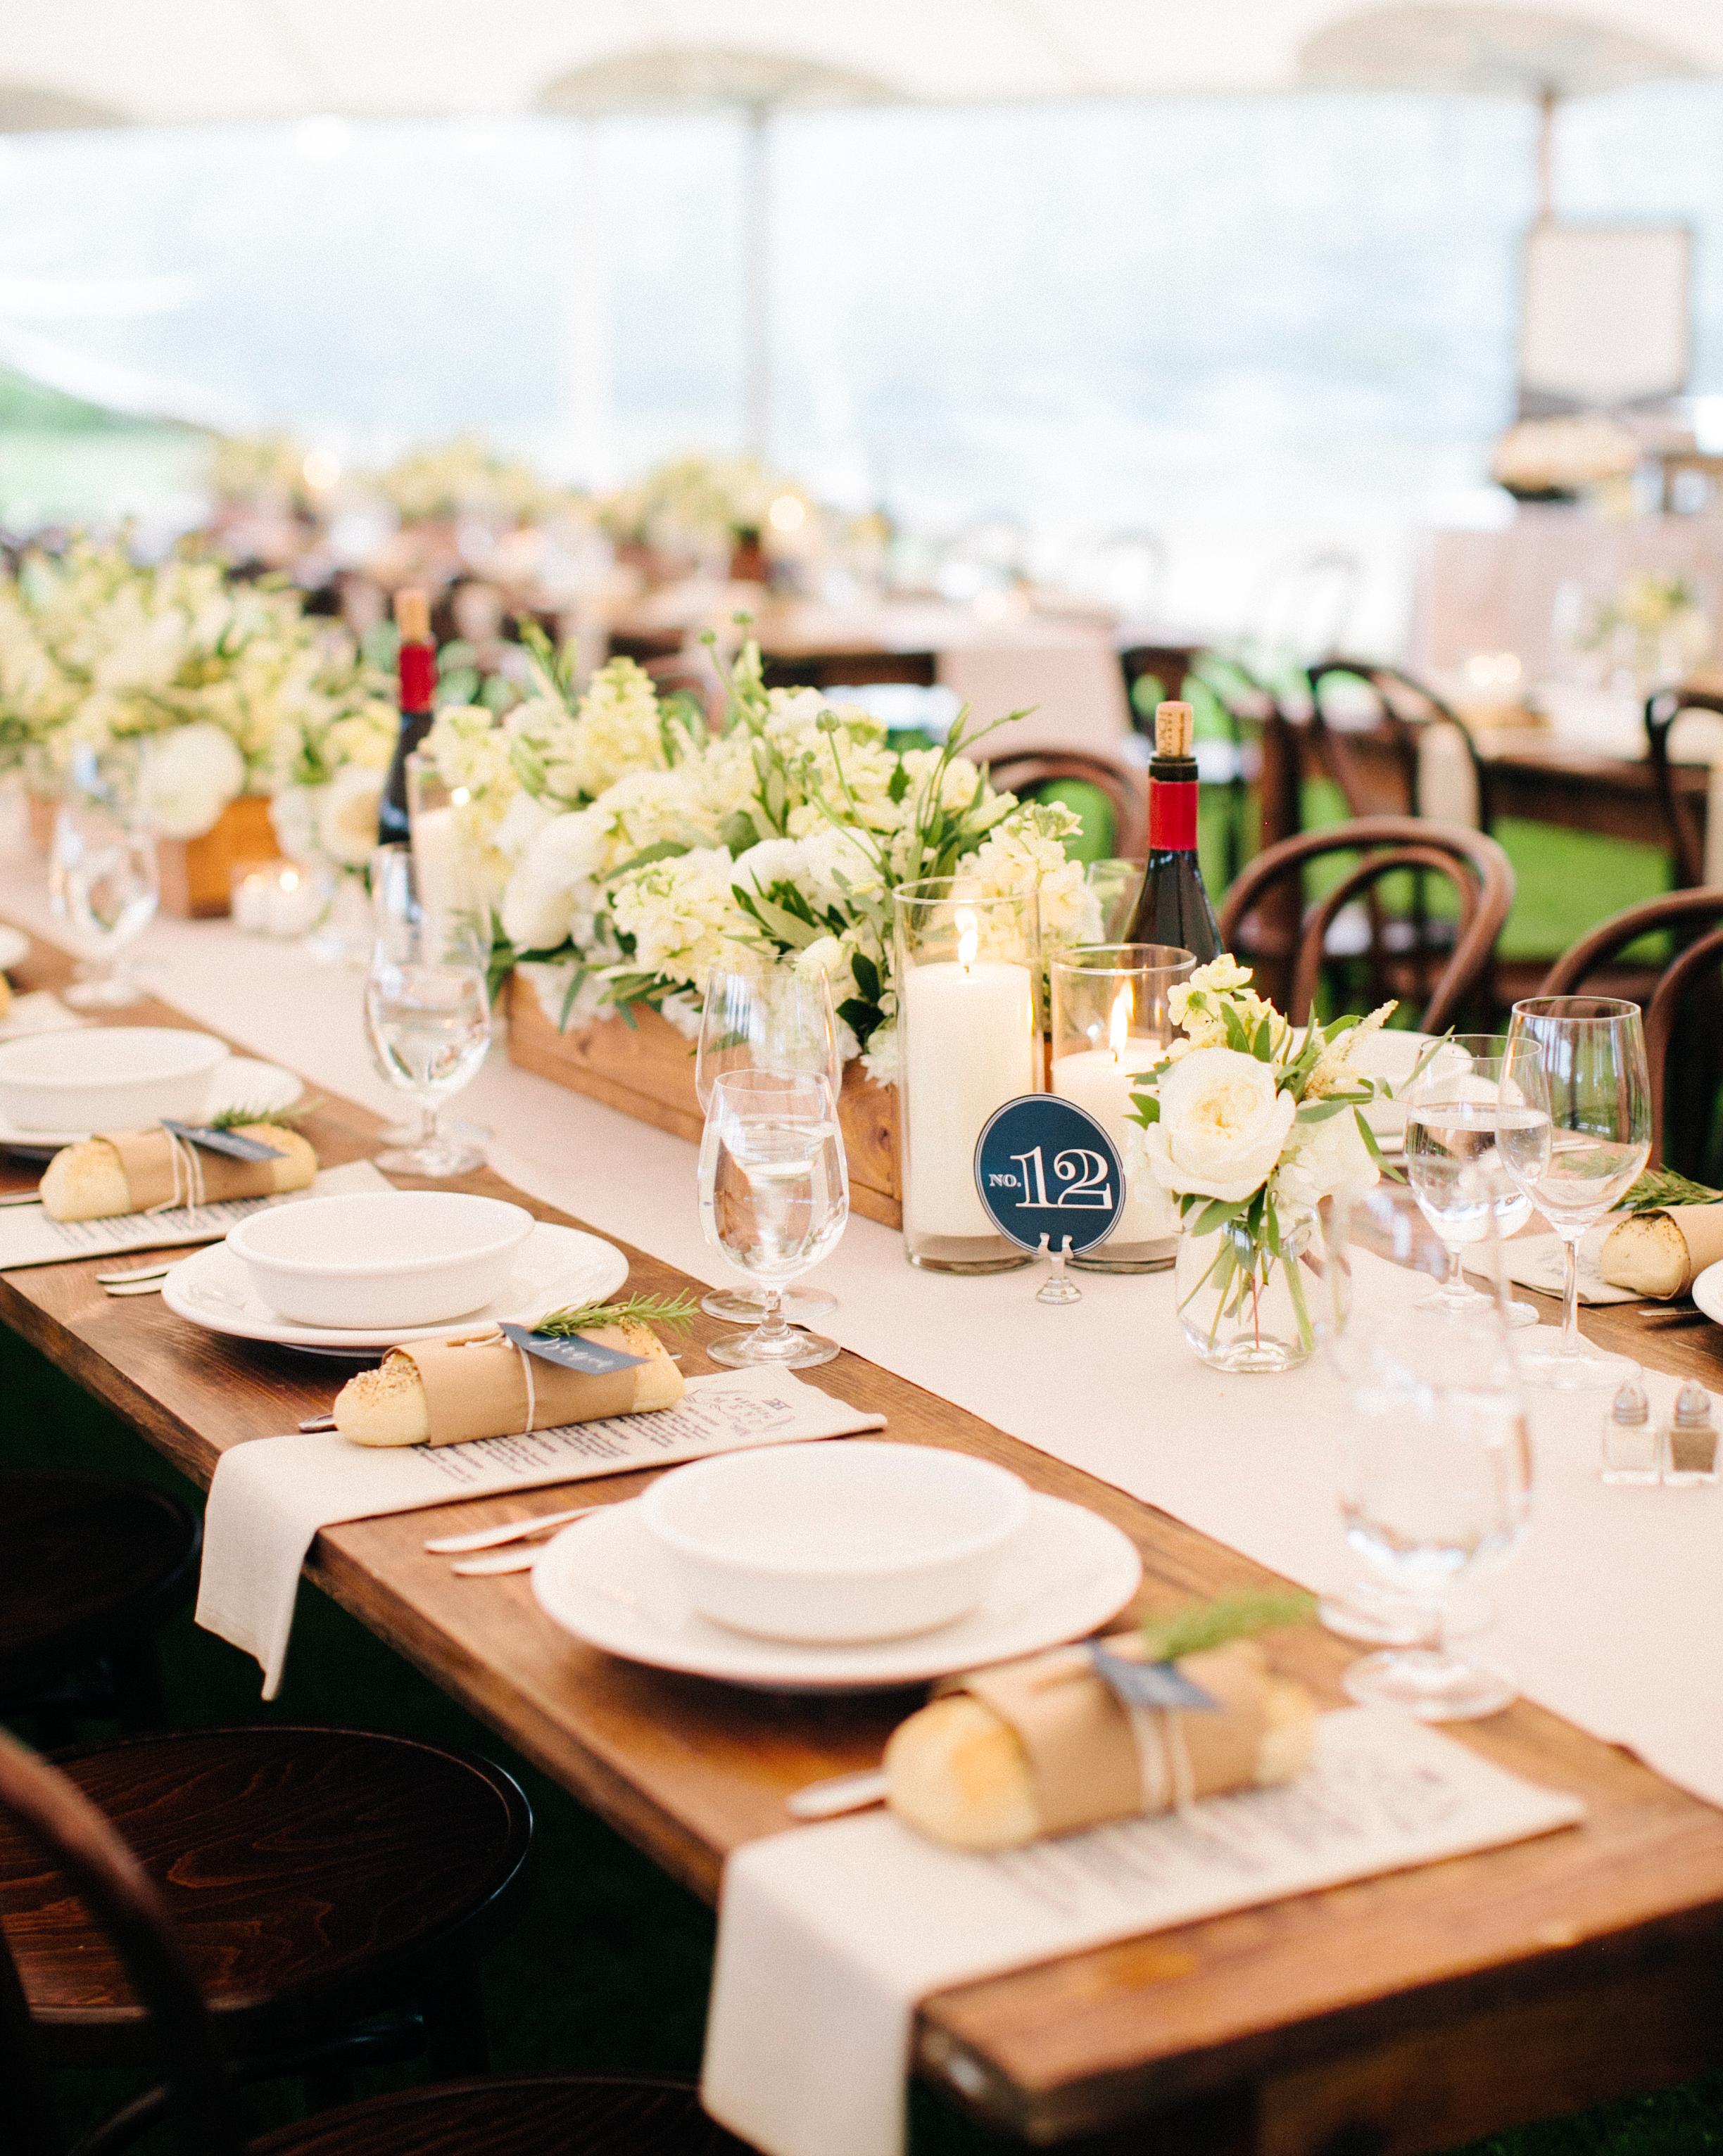 kristen-jonathan-wedding-table-0566-s112193-1015.jpg